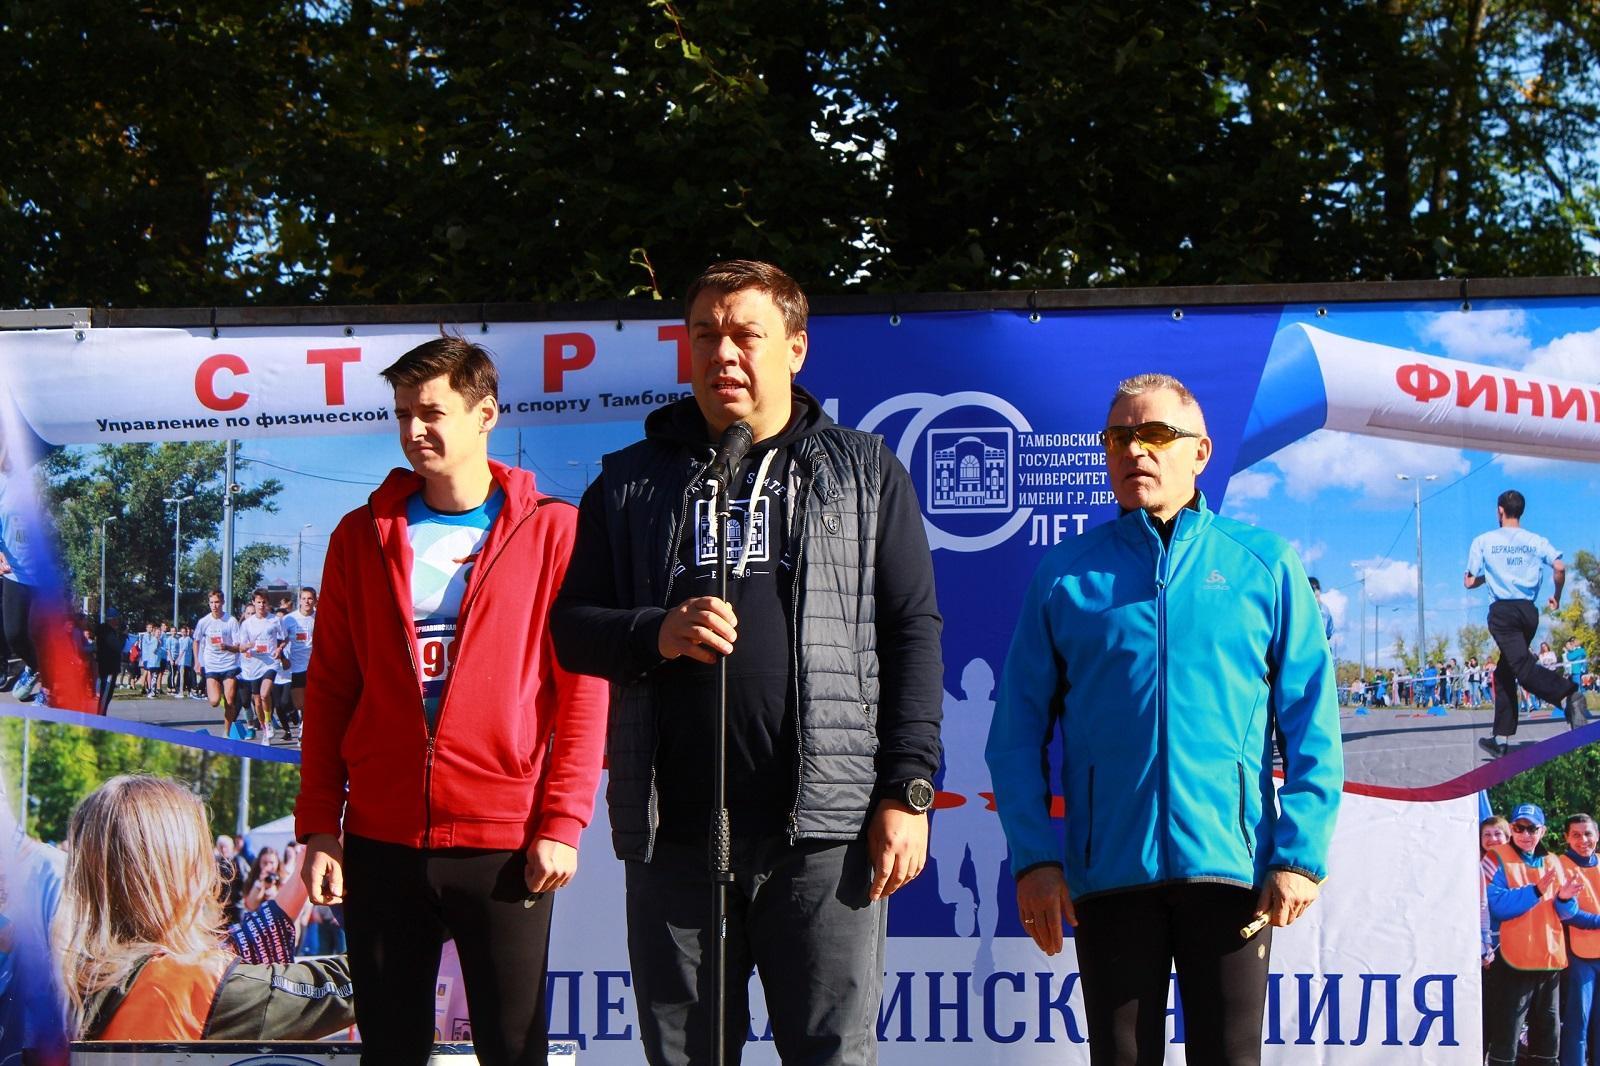 Корреспондент LifeTambov.ru пробежал Державинскую милю. Репортаж со спортивного праздника